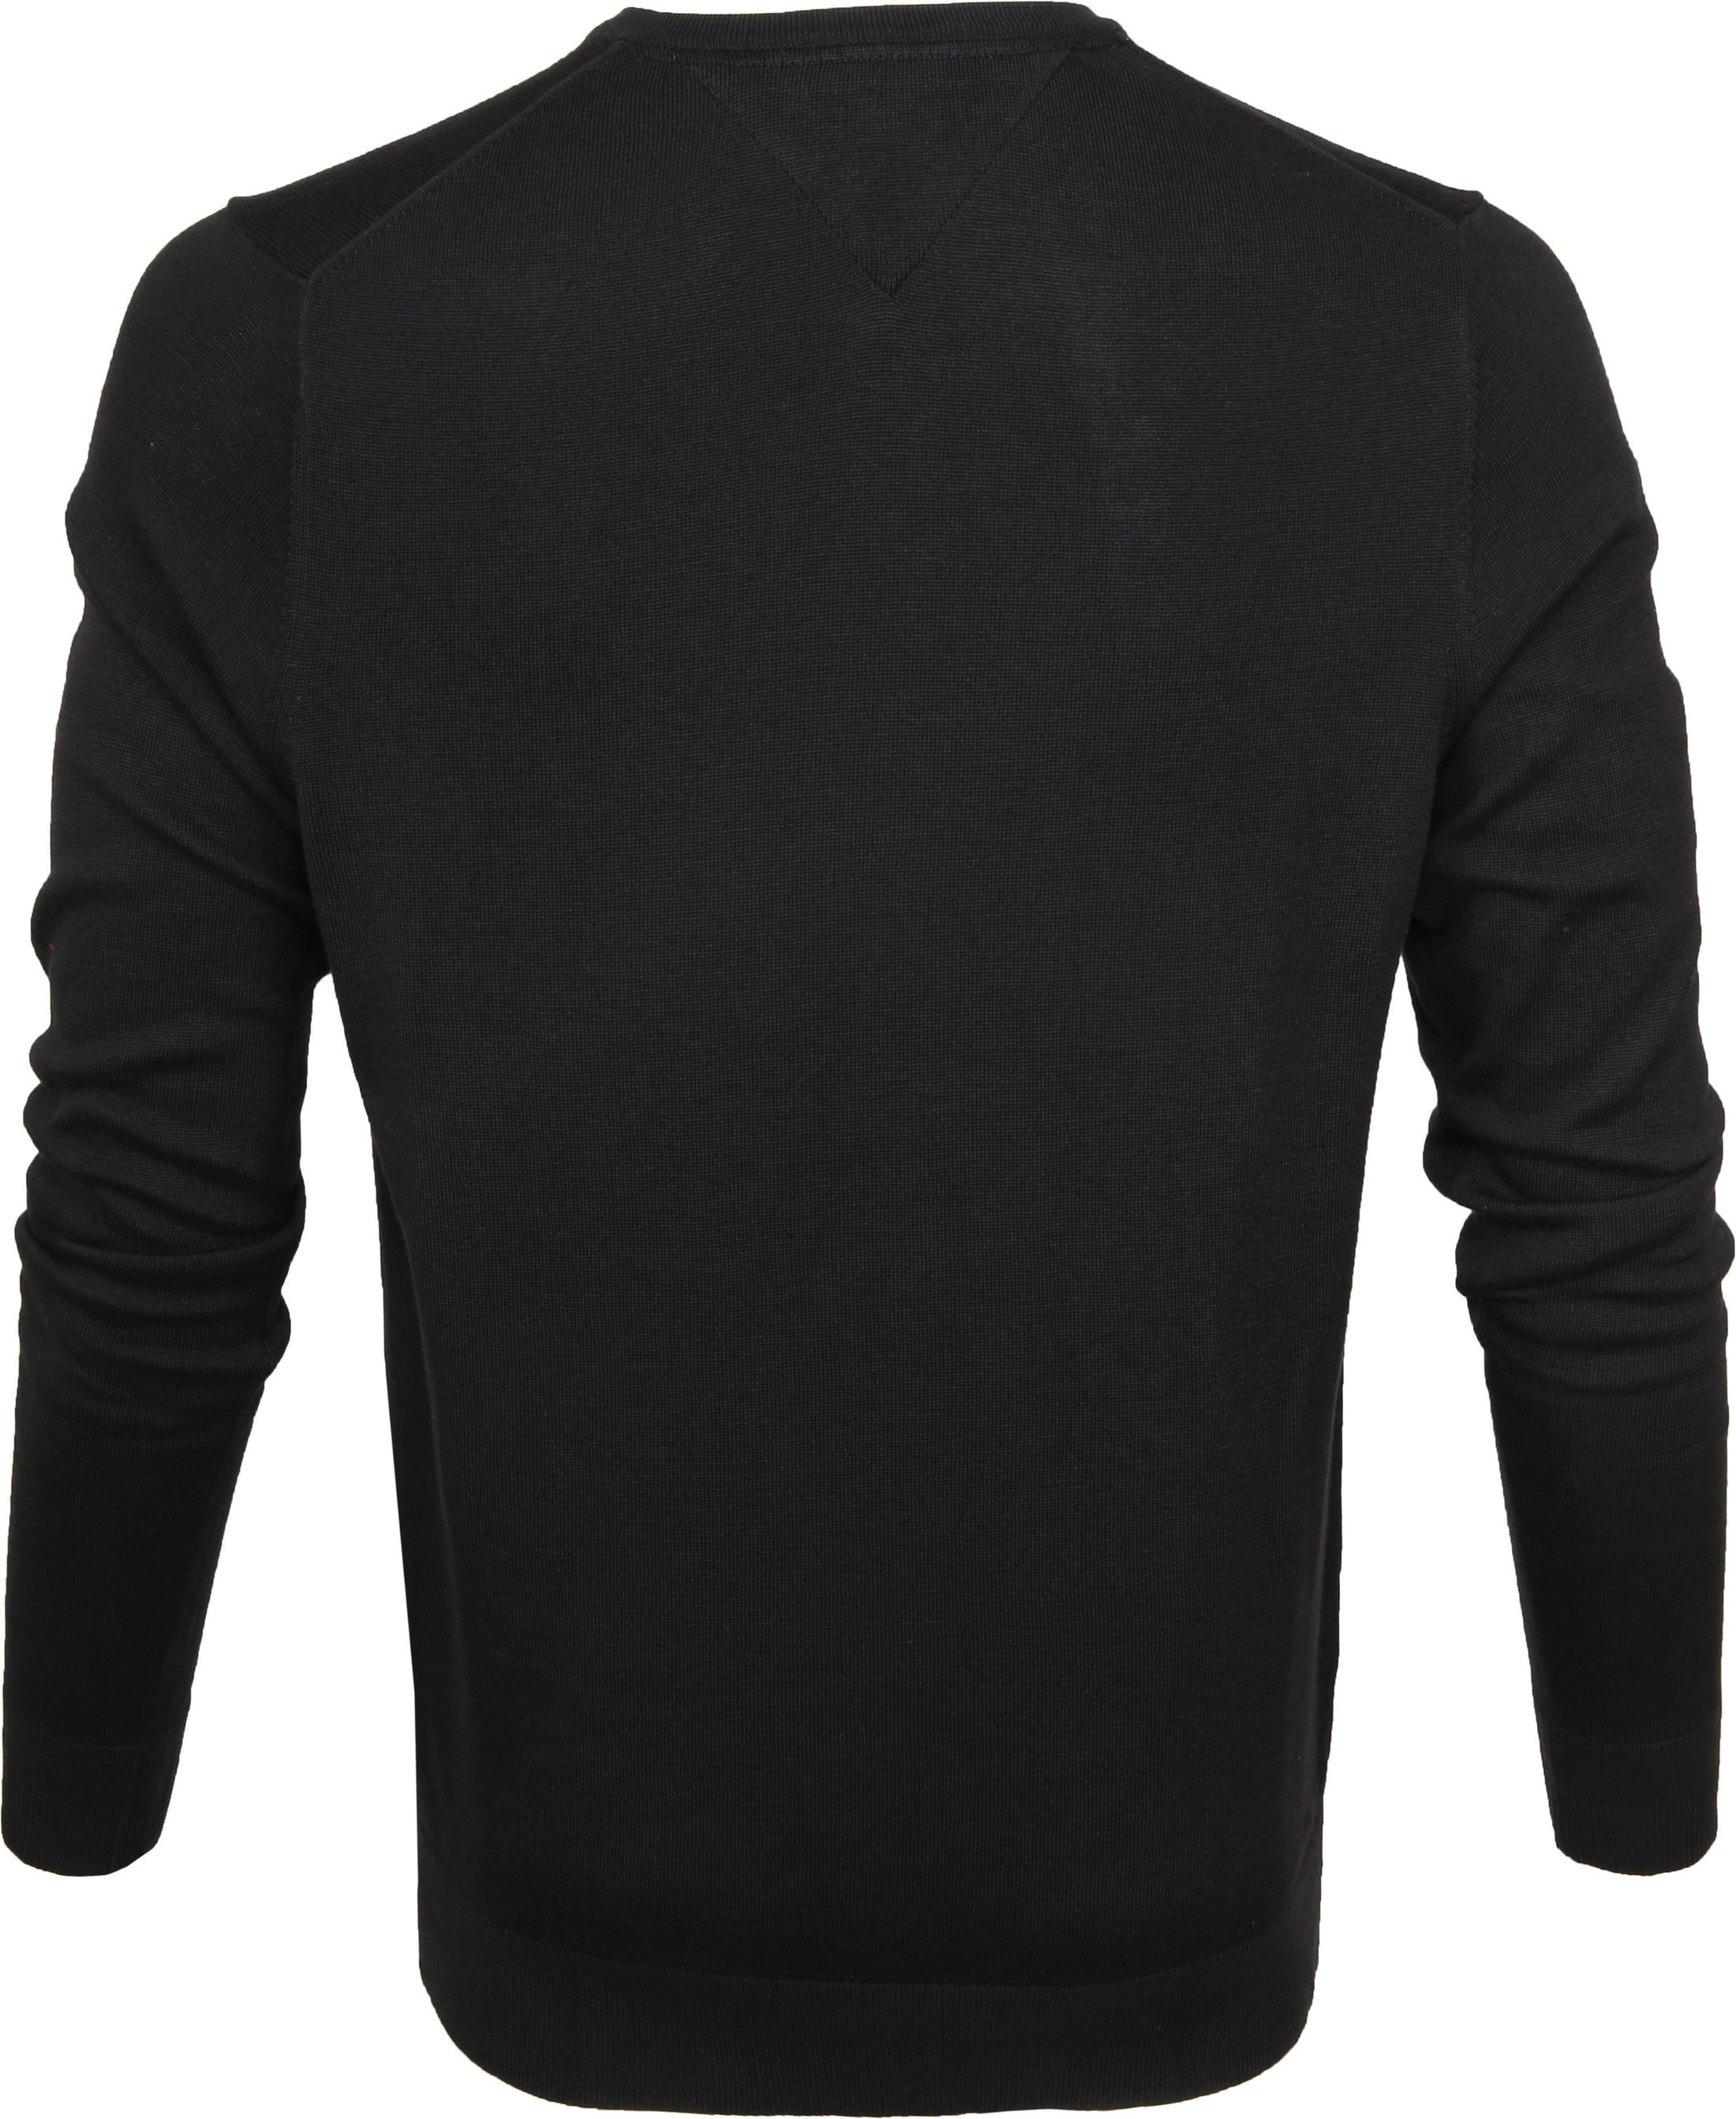 Tommy Hilfiger Pullover V-Hals Zwart